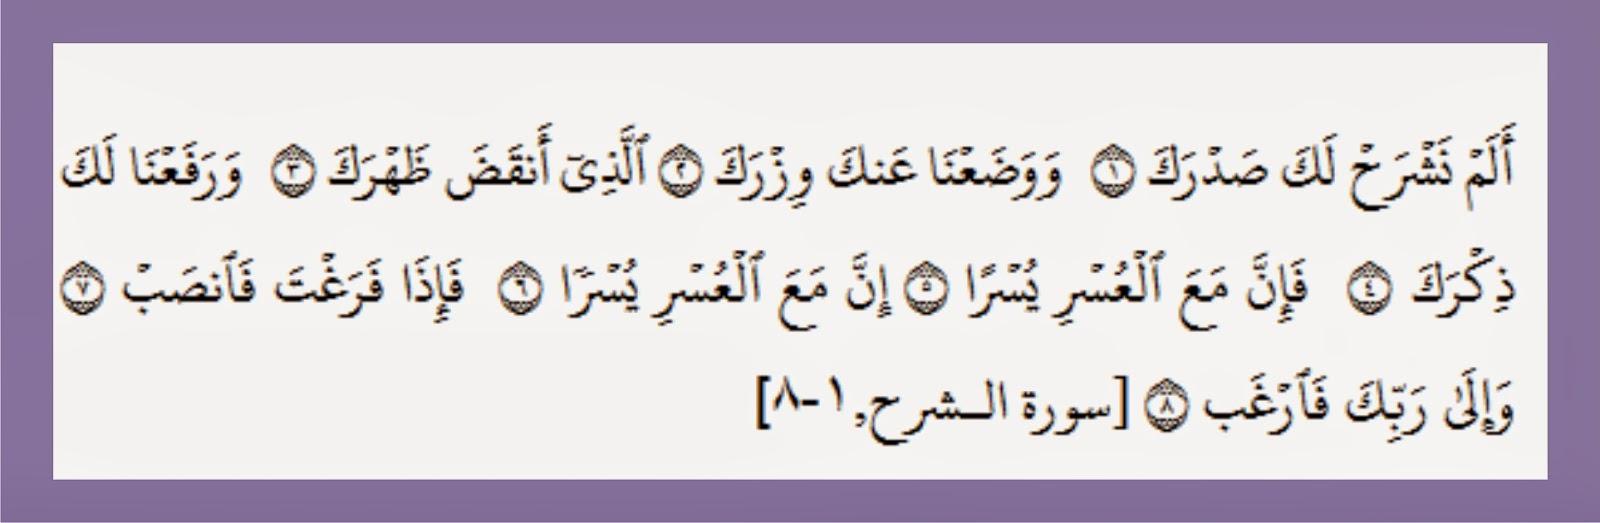 Bacaan Surah Ash Sharh dan Artinya